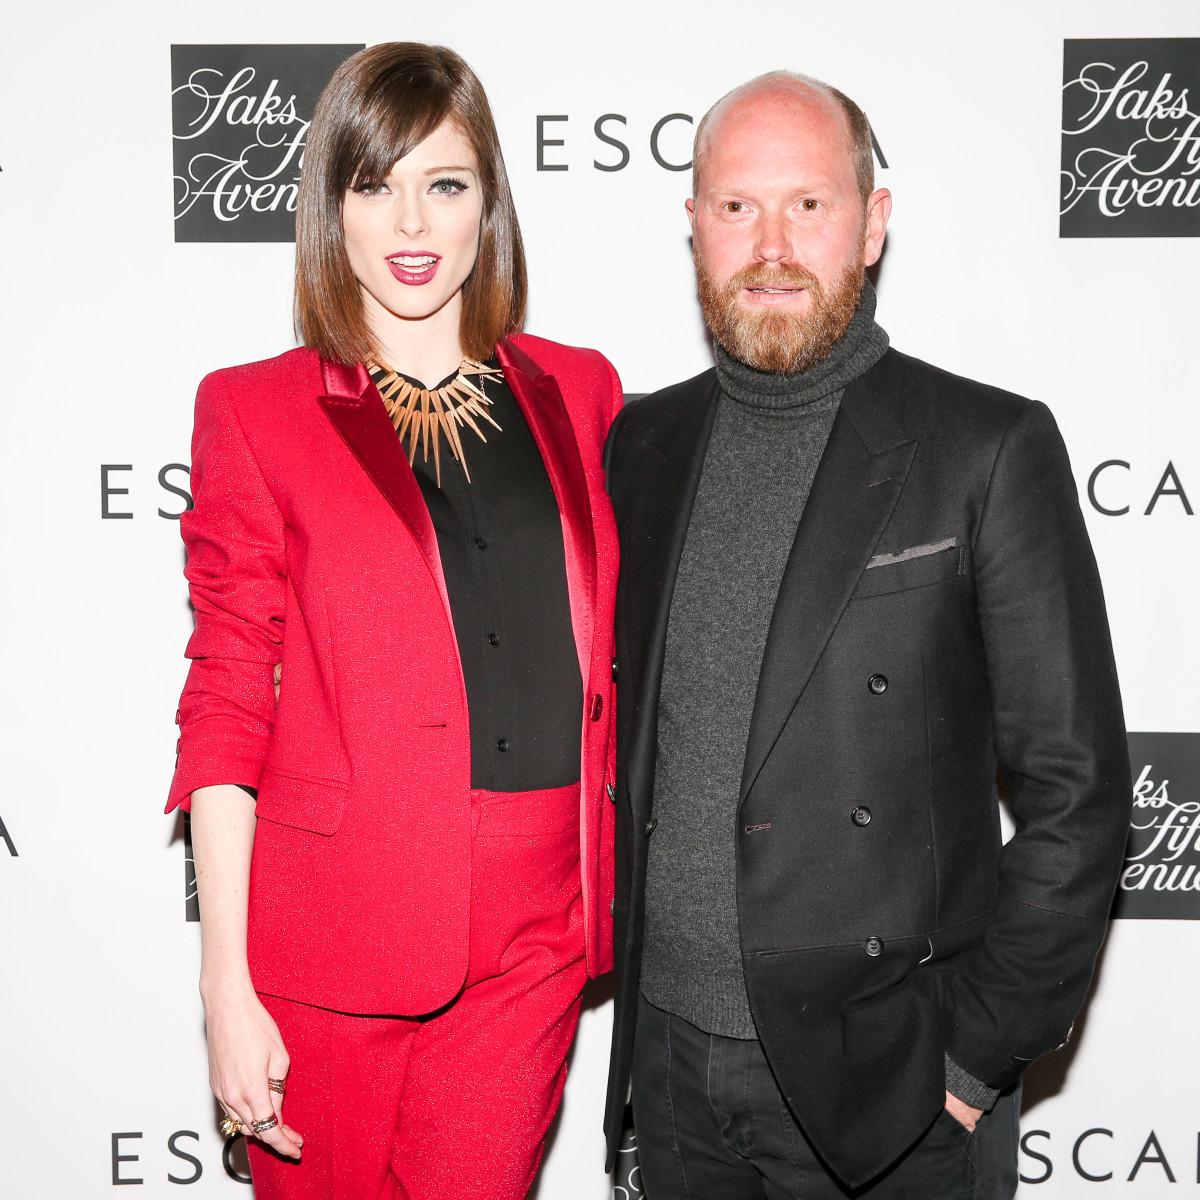 Model Coco Rocha and Escada Fashion Director Daniel Wingate. Photo: Courtesy of Billy Farrell Agency